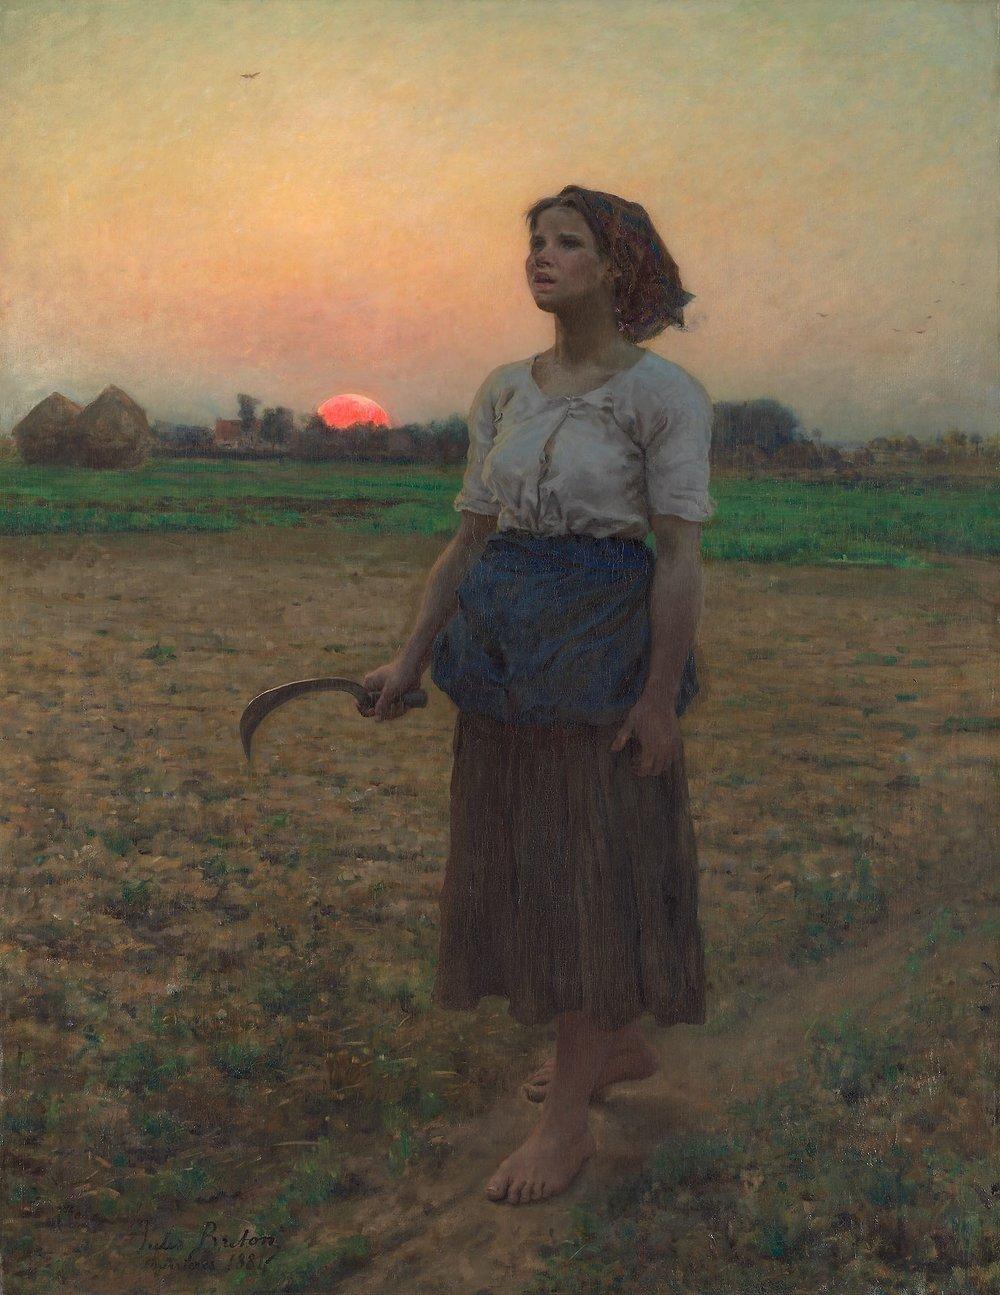 Jules Adolphe Breton,  The Song of the Lark